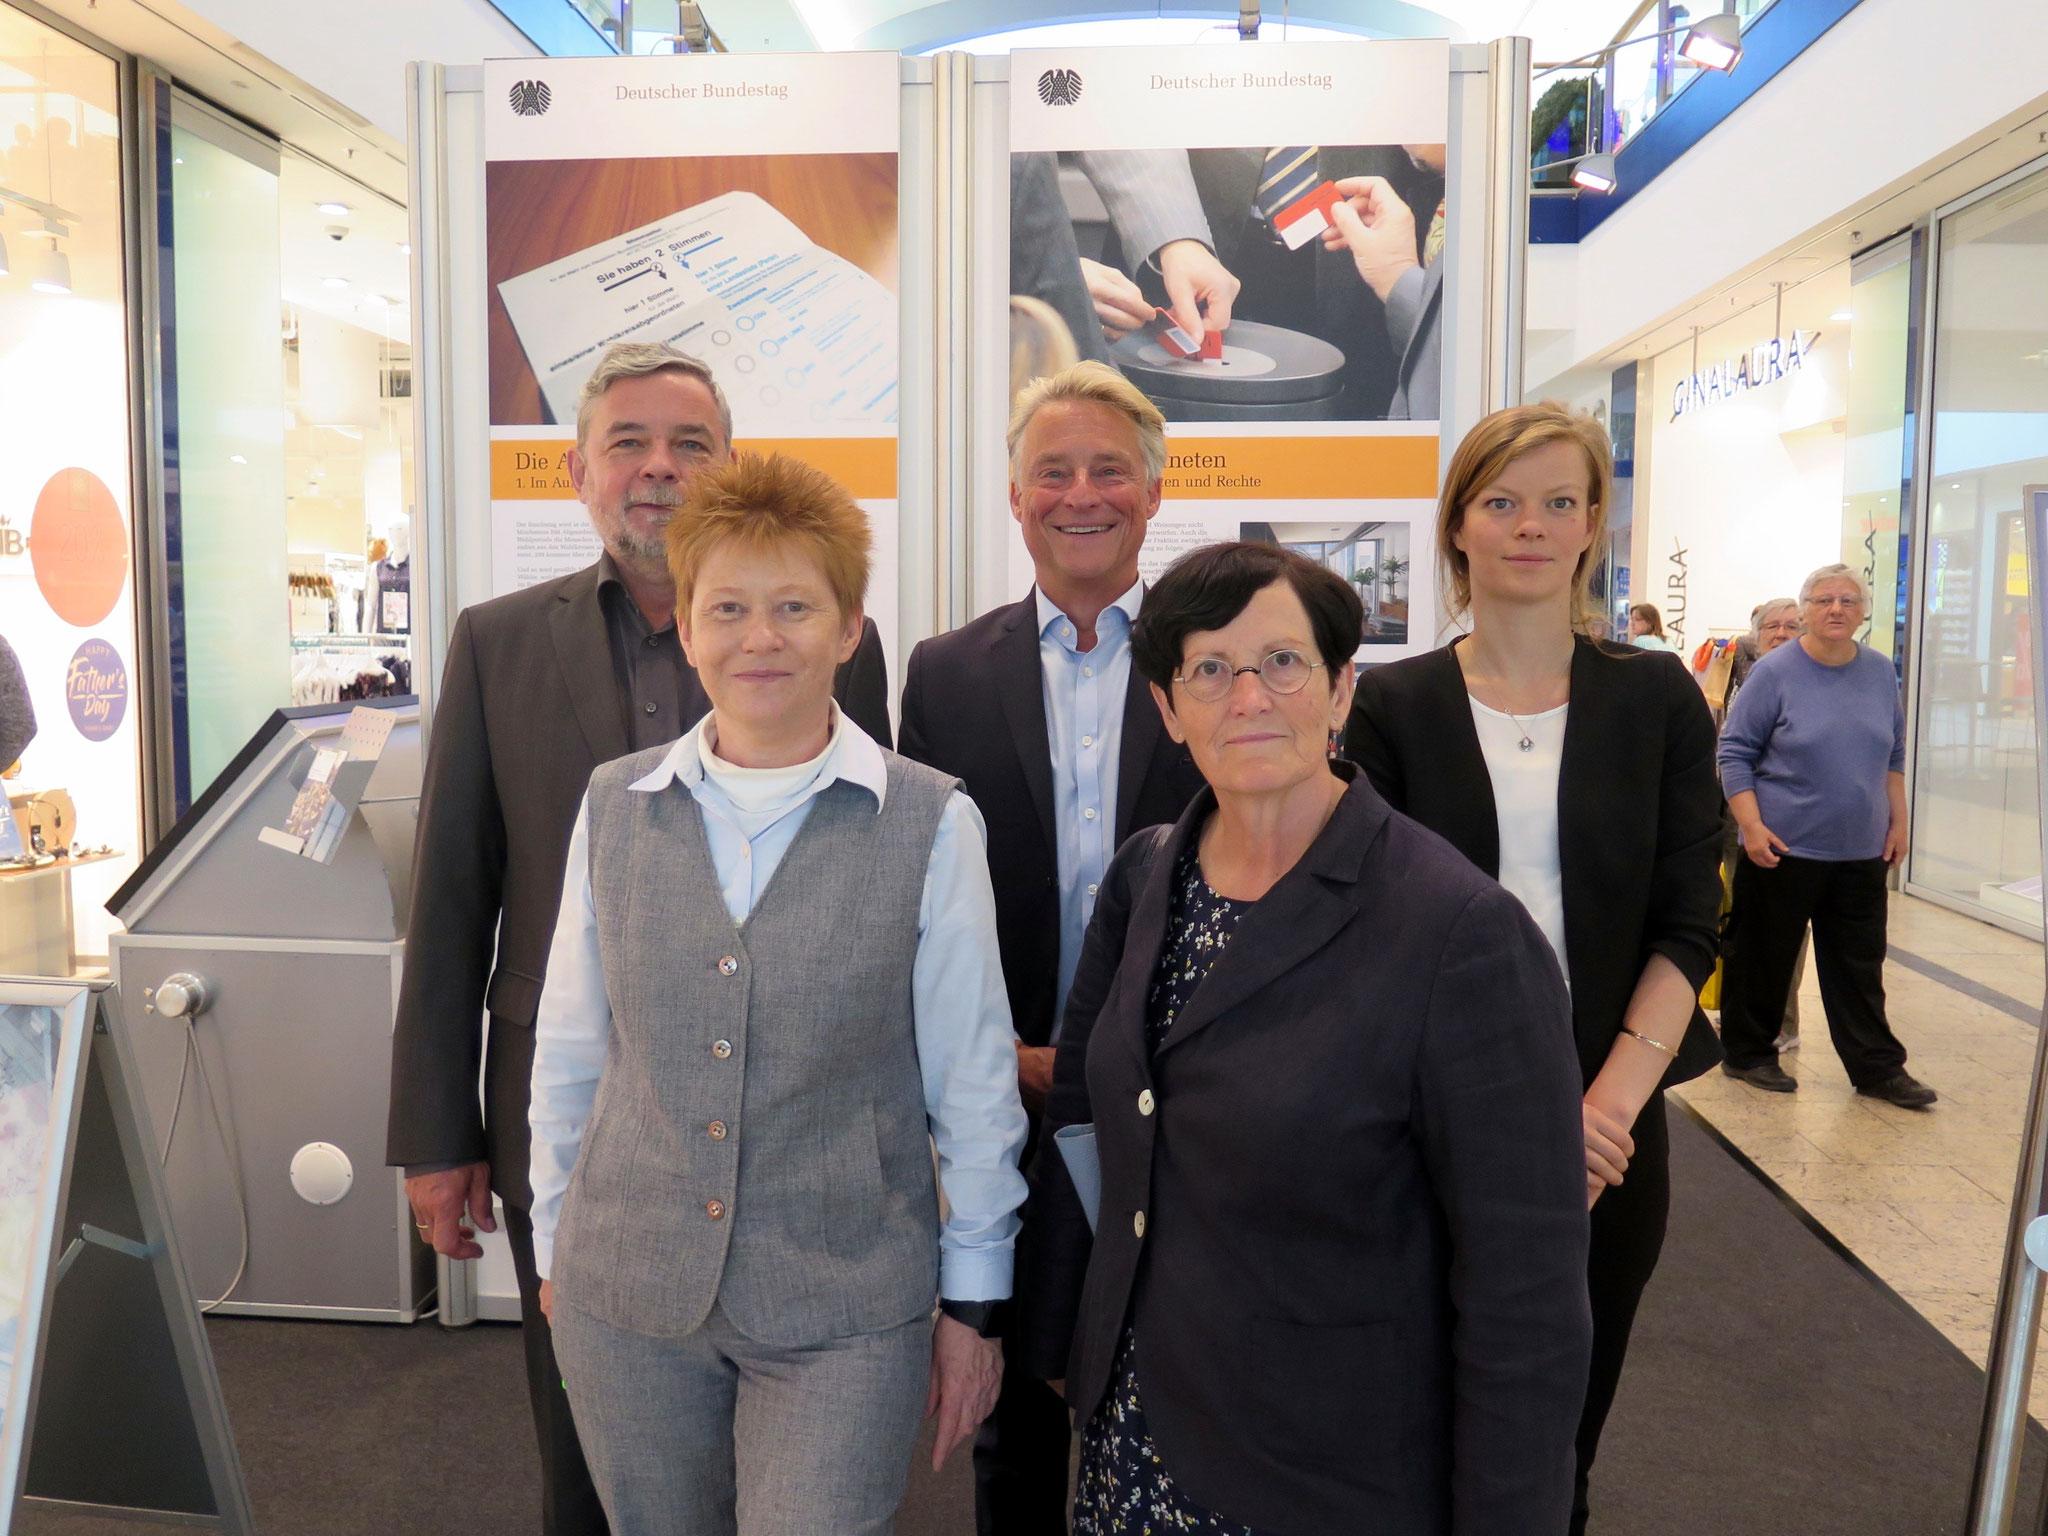 Von links nach rechts: Bernd Müller, Technischer Leiter des Eastgate, Petra Pau, Michael Kresin,  Dagmar Pohle und Teresa Busse